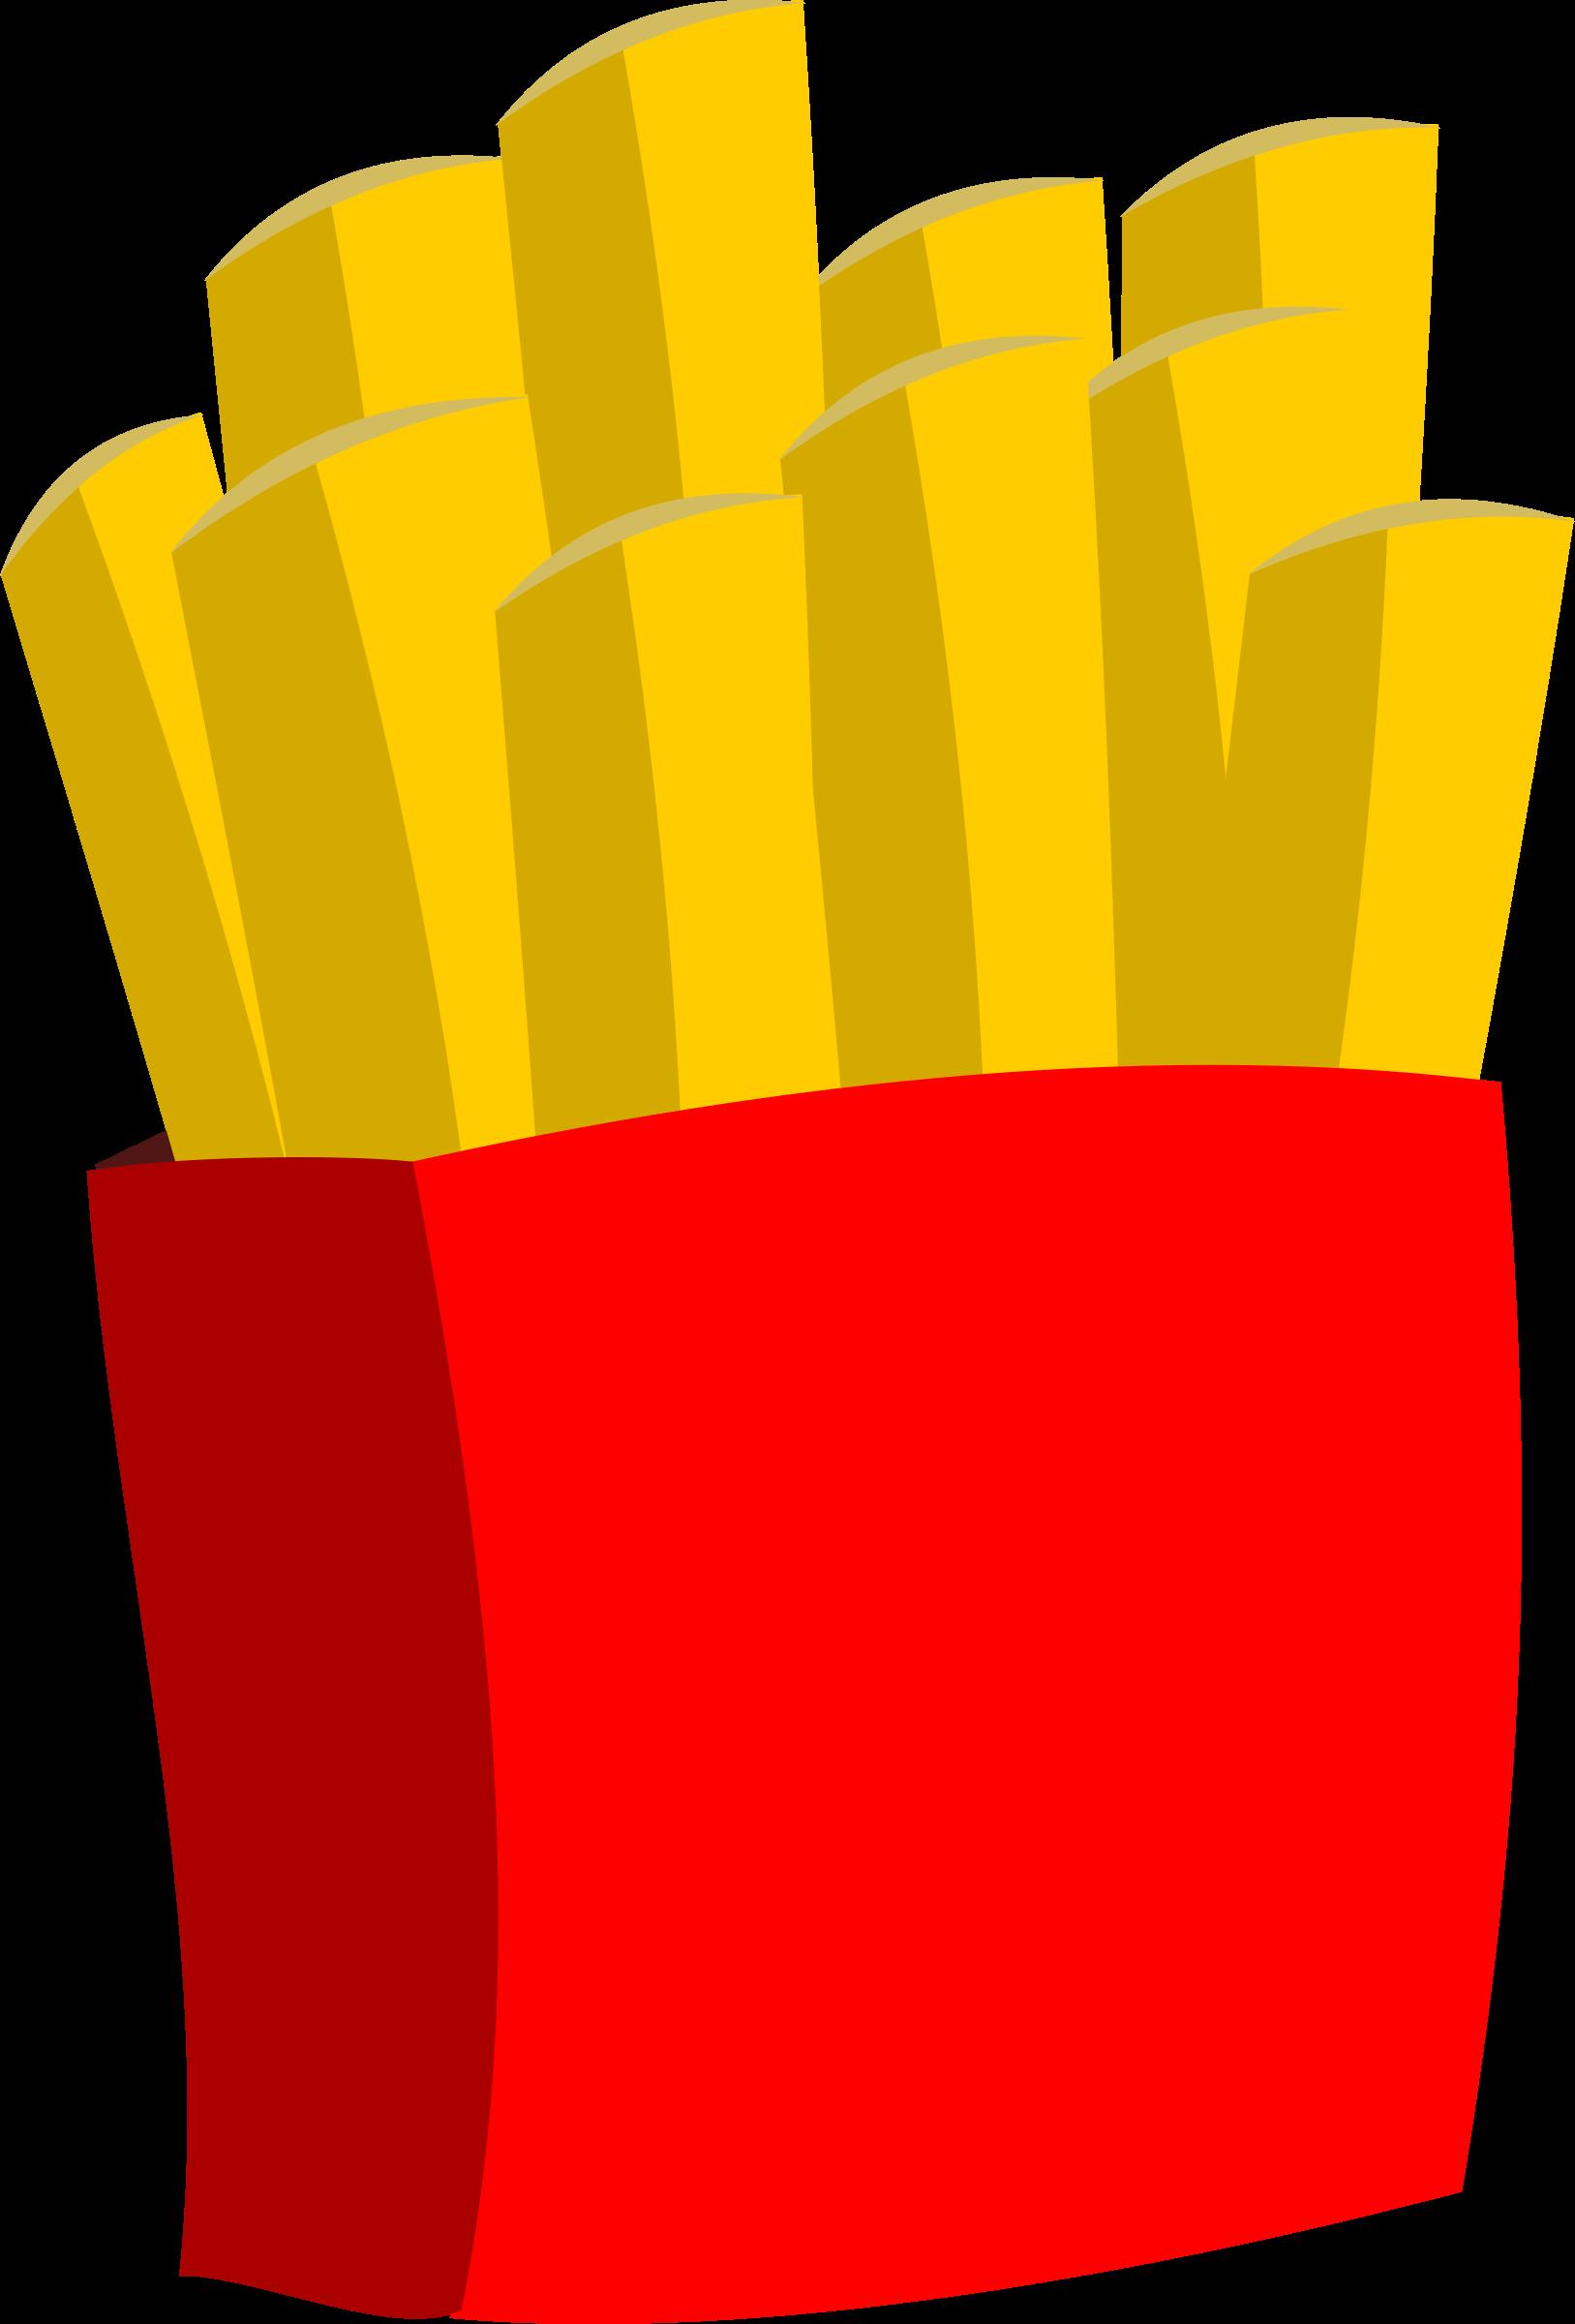 Hot big image png. Chips clipart cartoon